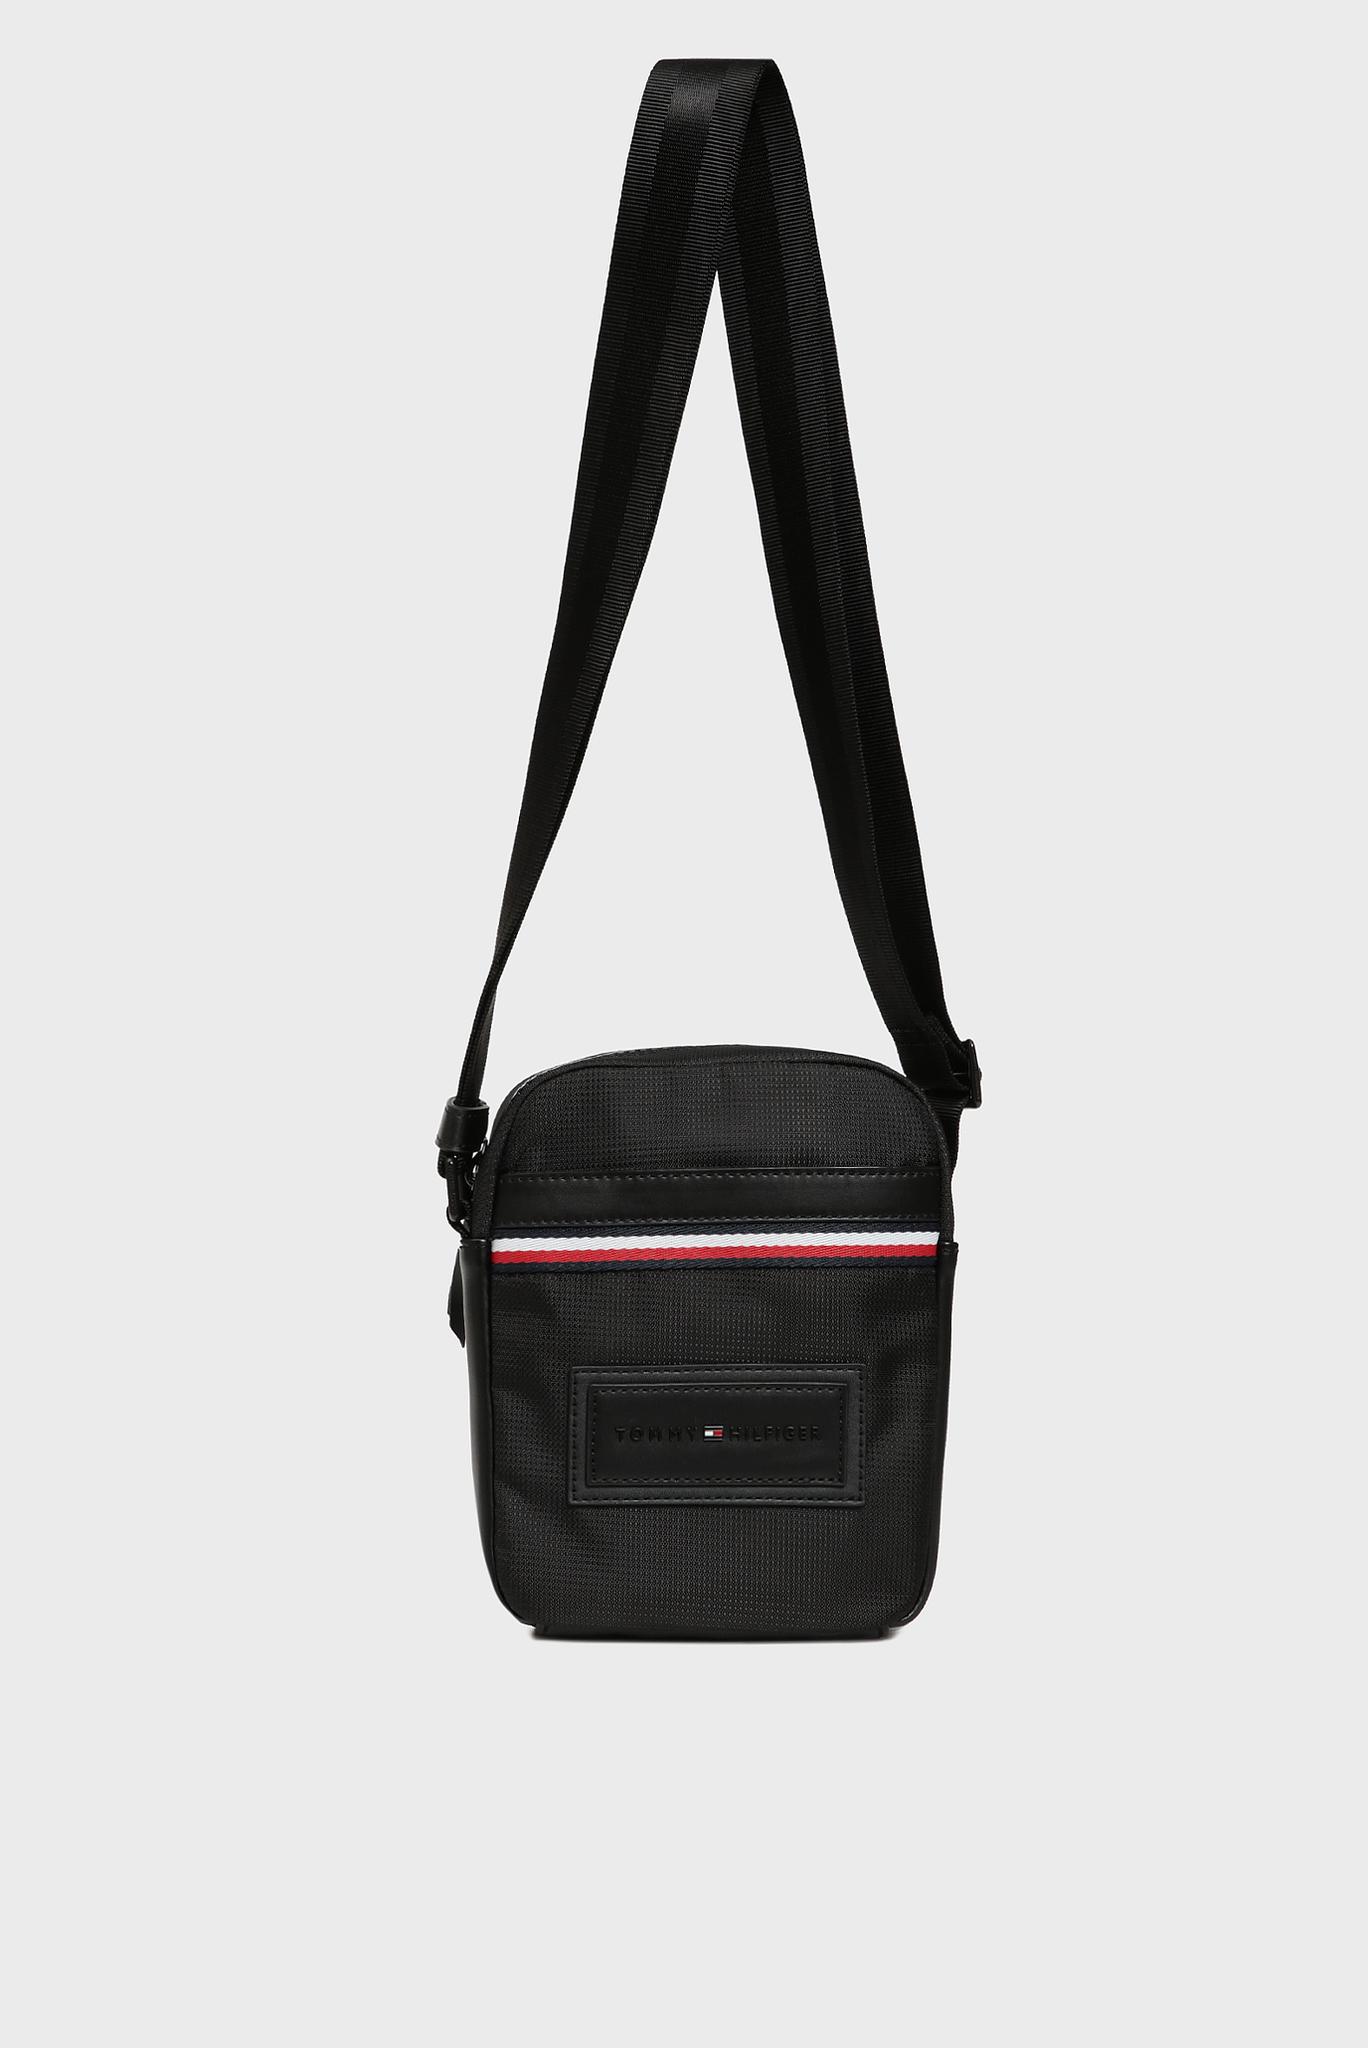 Мужская черная сумка через плечо MODERN NYLON MINI REPORTER Tommy Hilfiger